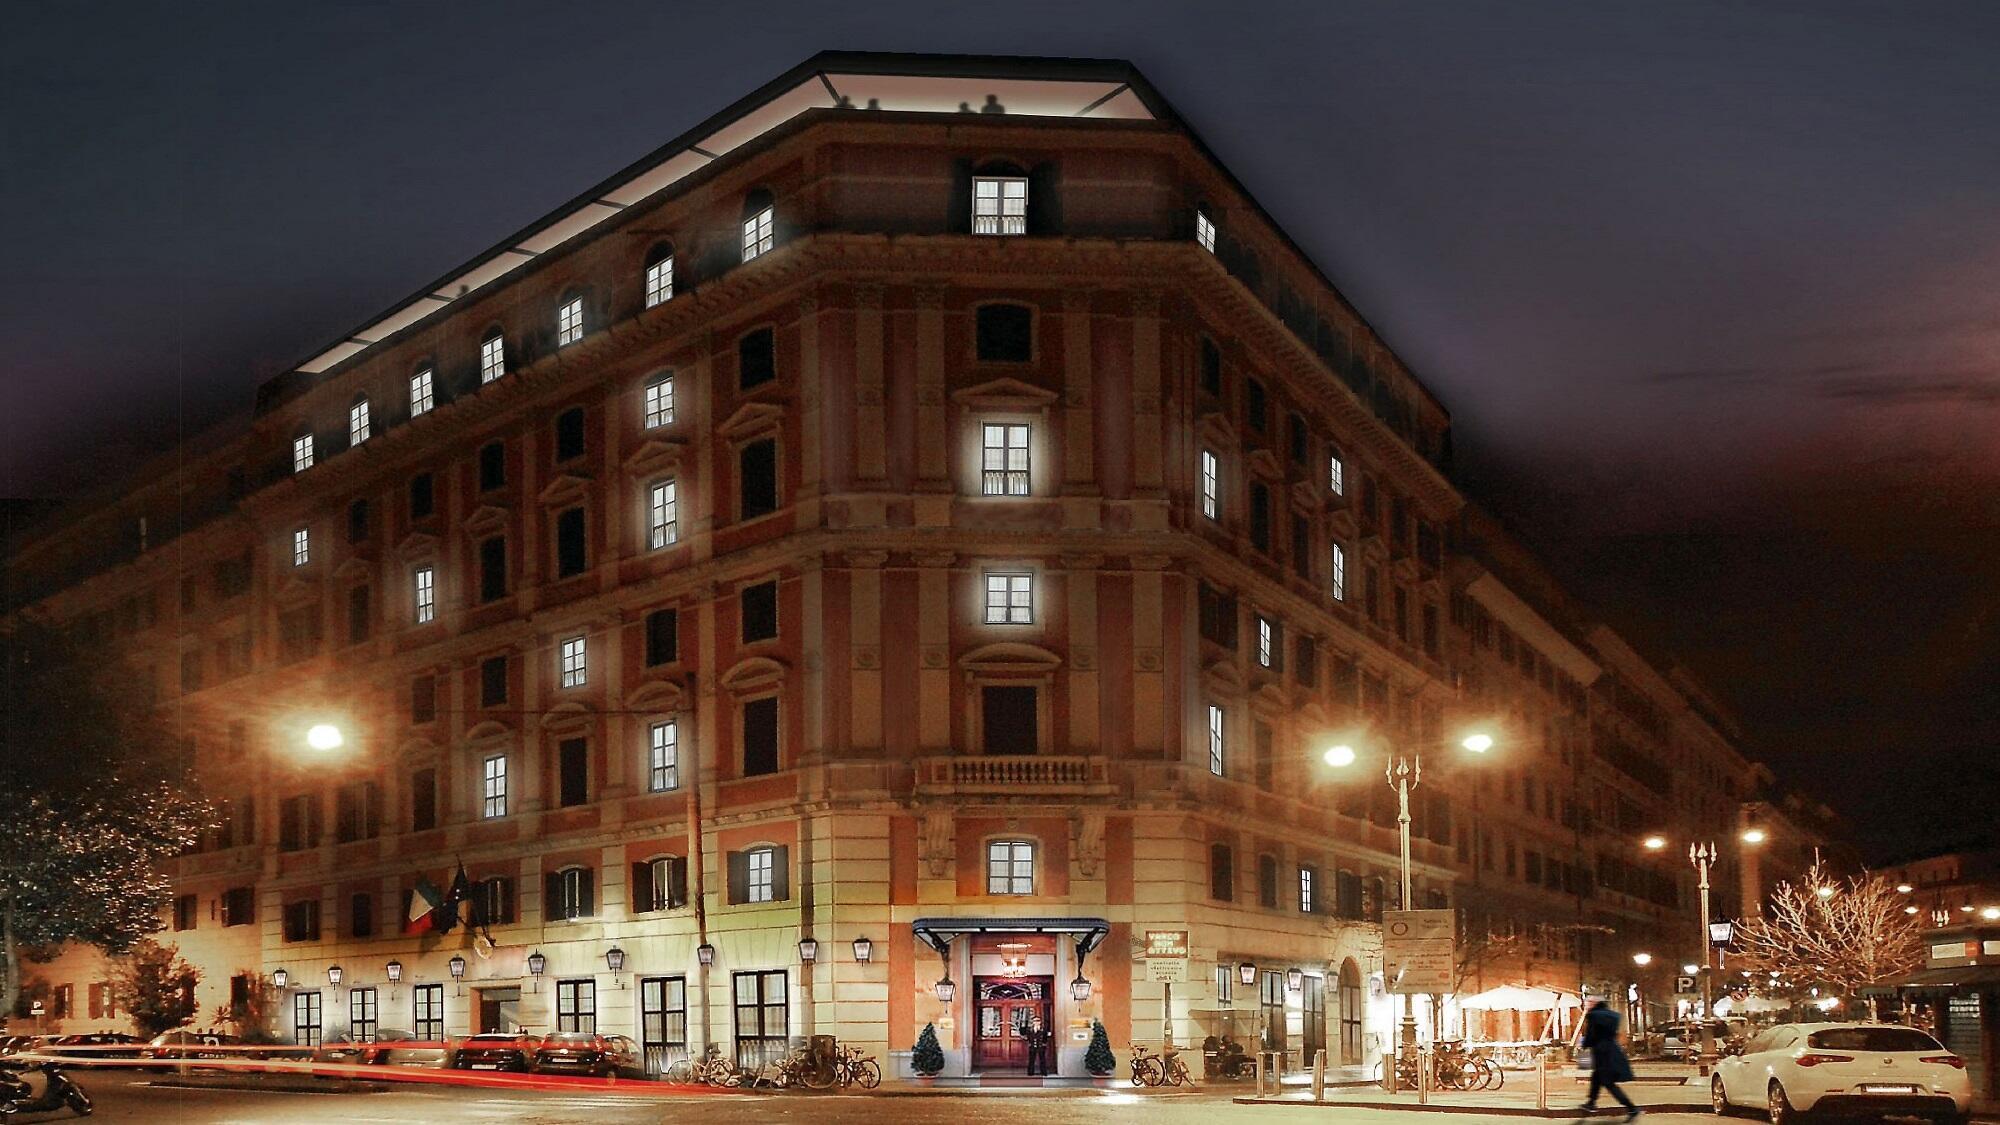 Hotel Trastevere Rome exterior view